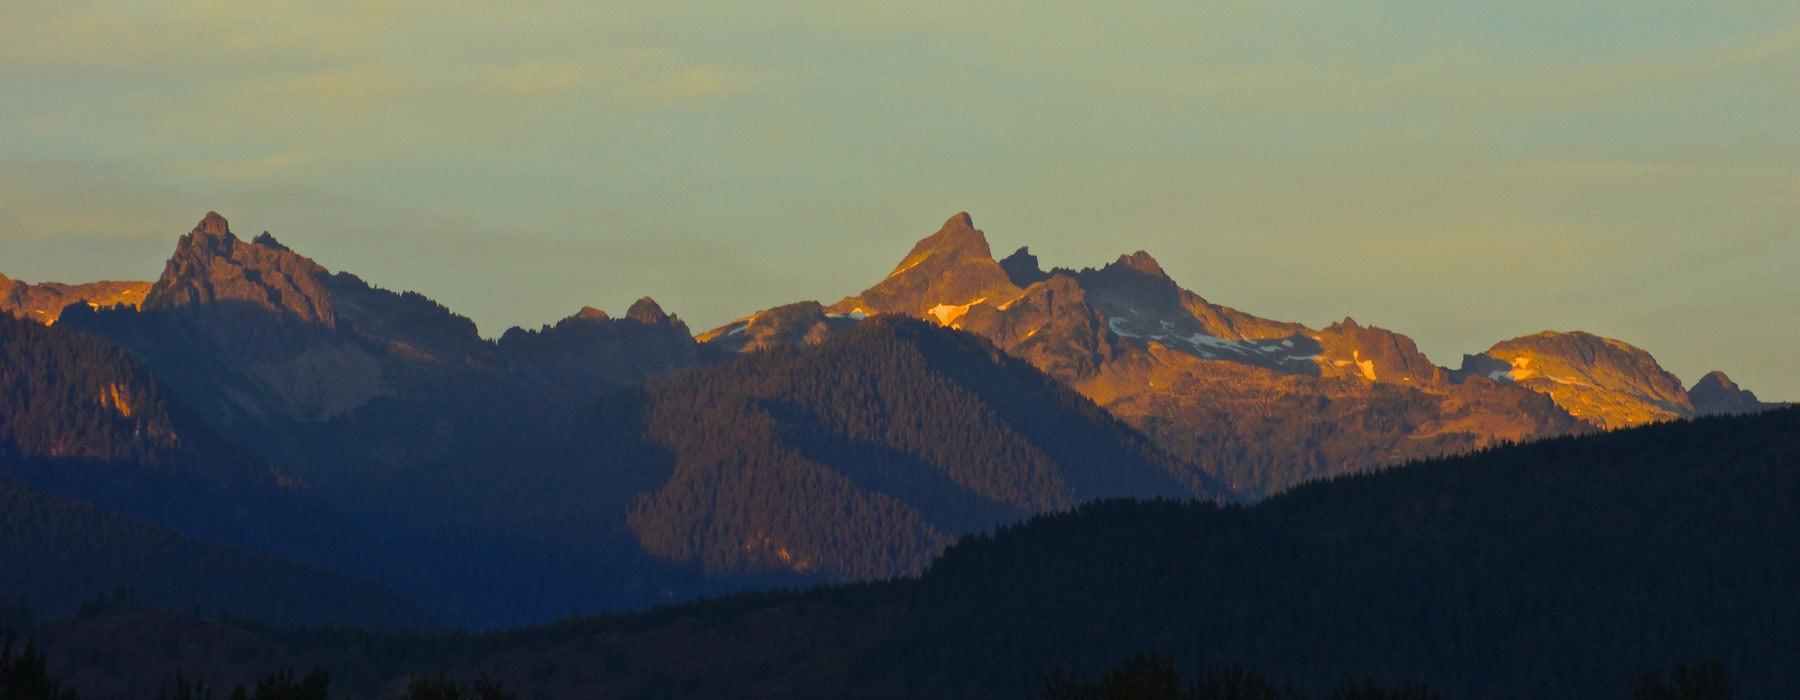 mountain range against a blue sky